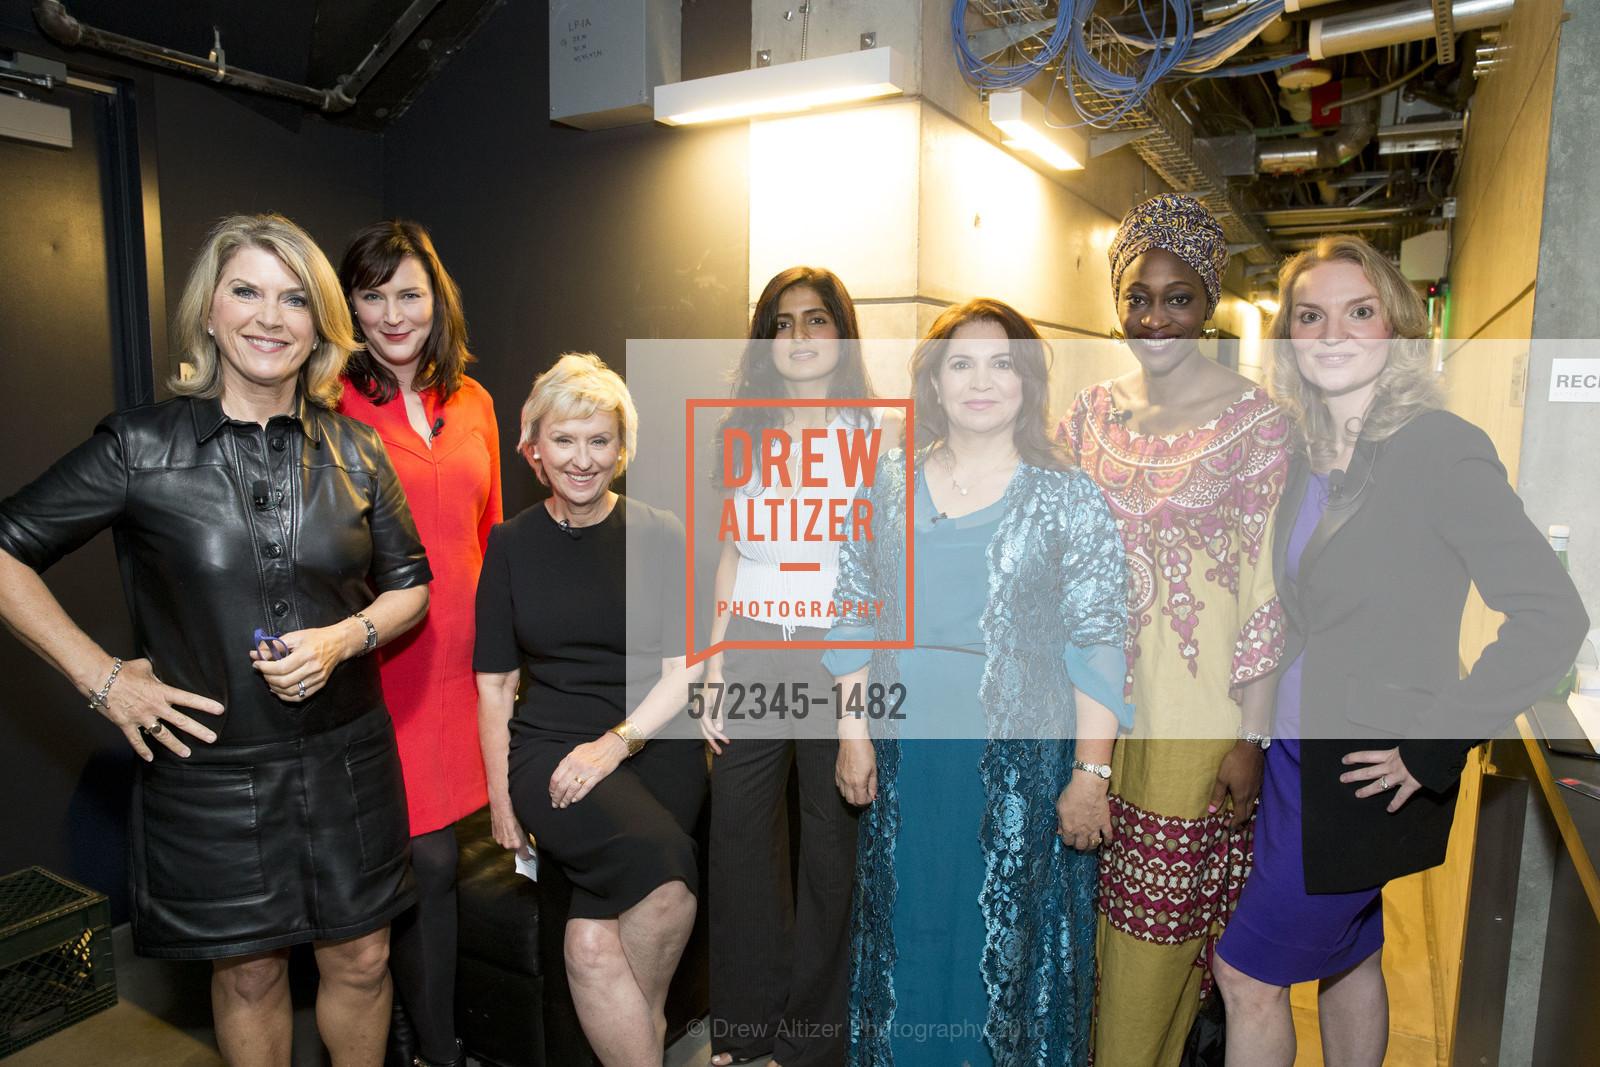 Kathleen Matthews, Audrey Cooper, Tina Brown, Akanksha Hazari, Khanim Latif, Hafsat Abiola, Alyse Nelson, Photo #572345-1482